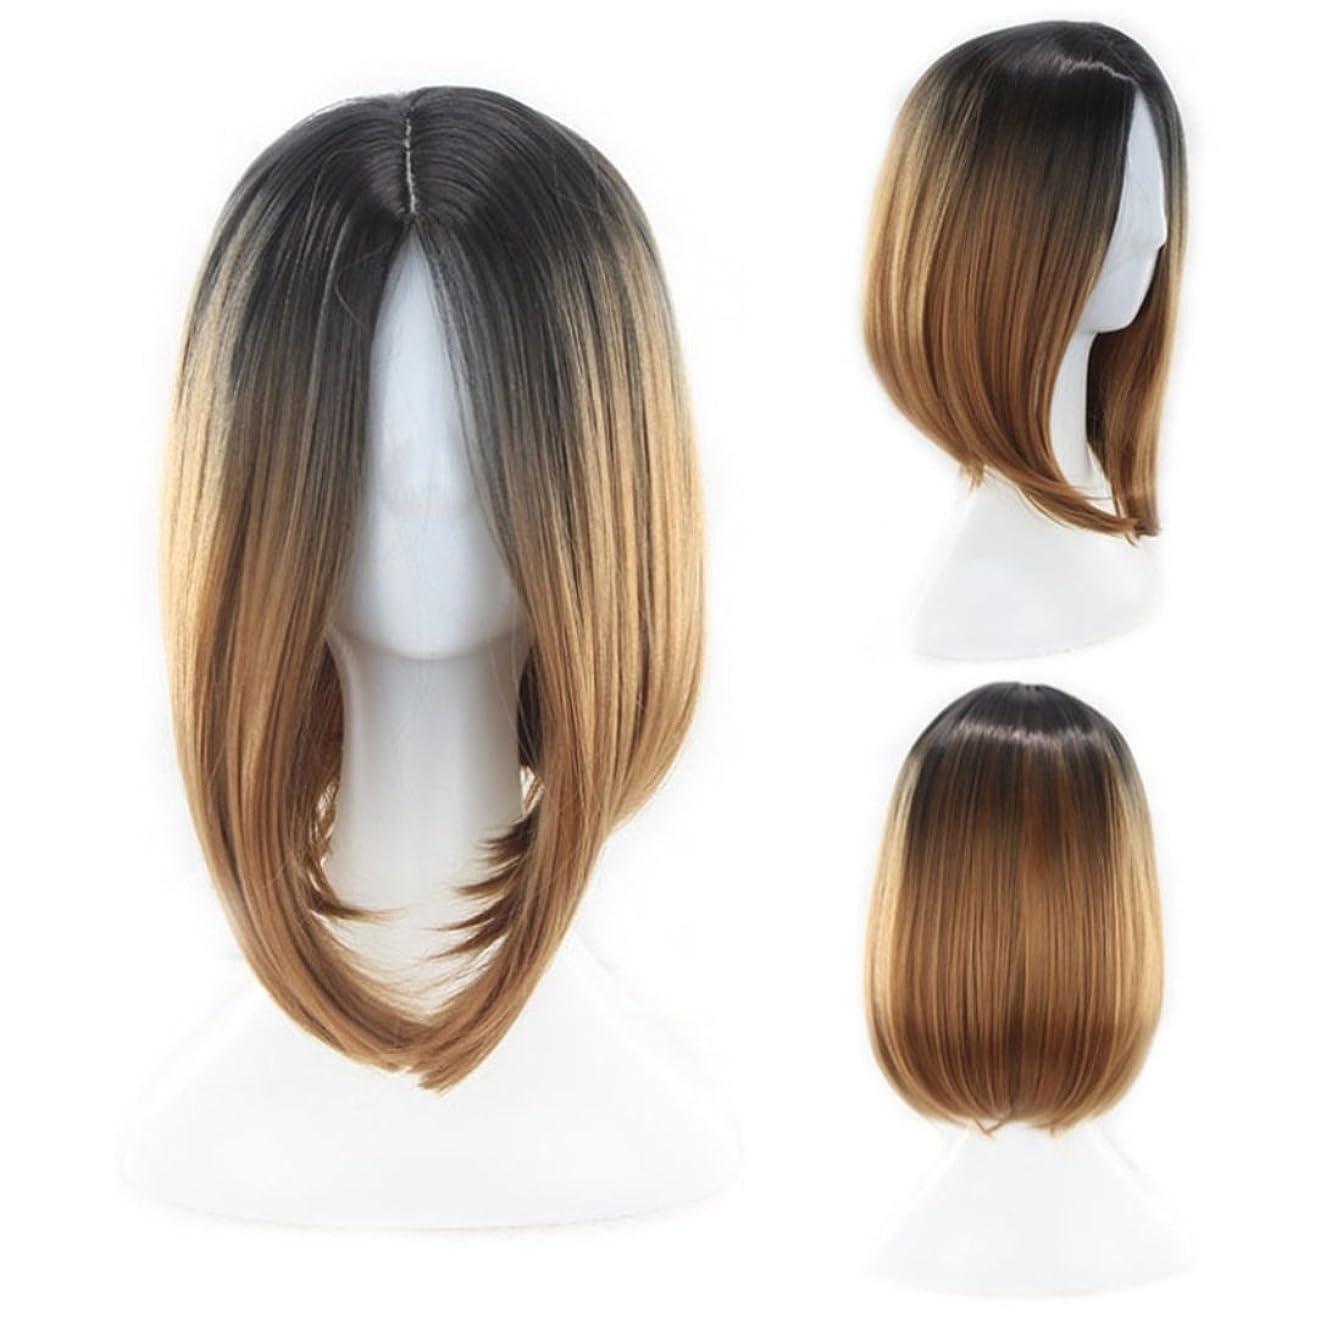 JIANFU 女性用ナチュラルグラデーションカラーウィッグミドルバンズ付きショートボボヘッドウィッグ髪用耐熱ウィッグ長さ35cm (Color : Brown gradient)